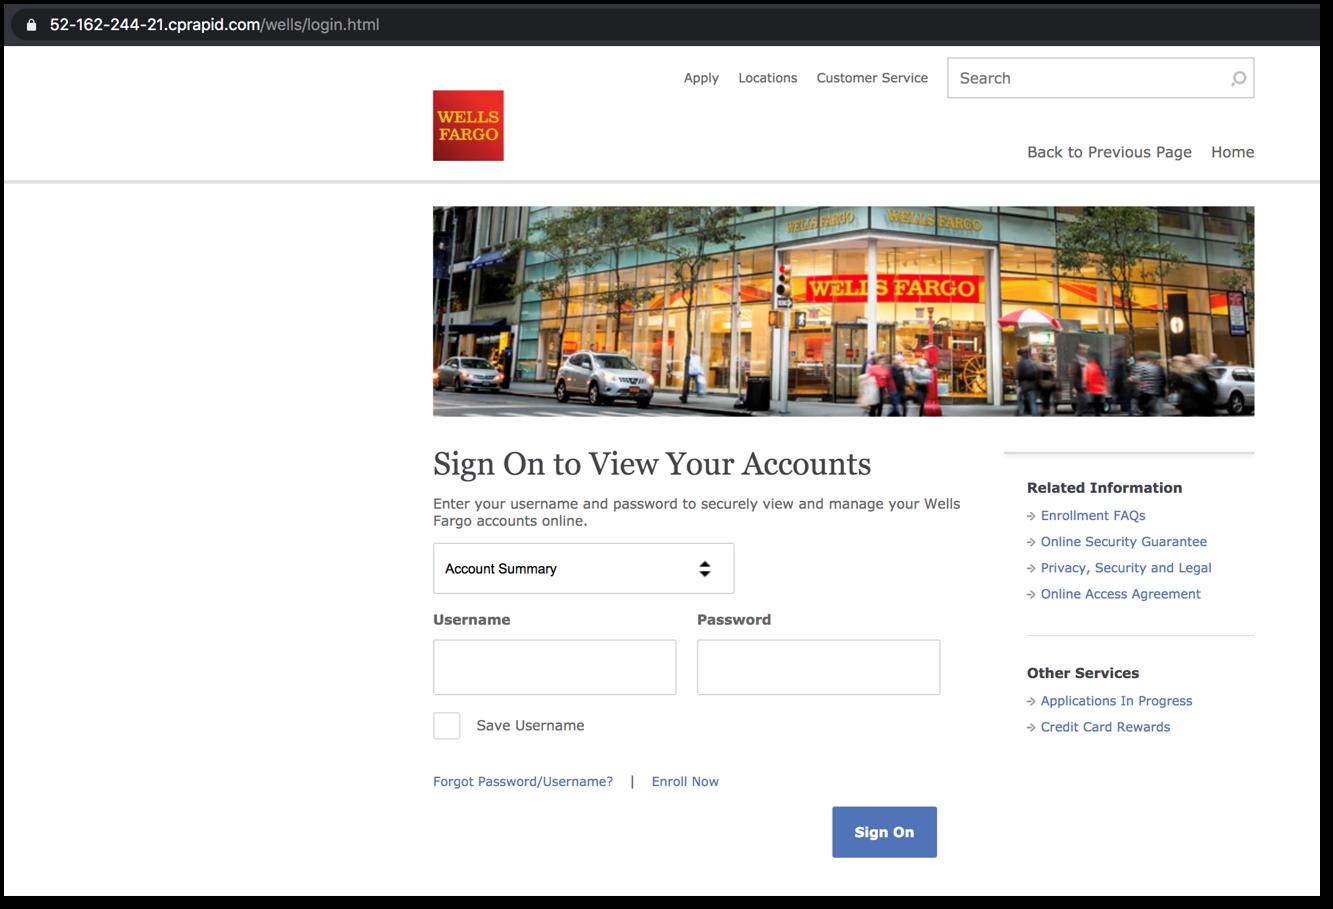 Wells Fargo phishing page final